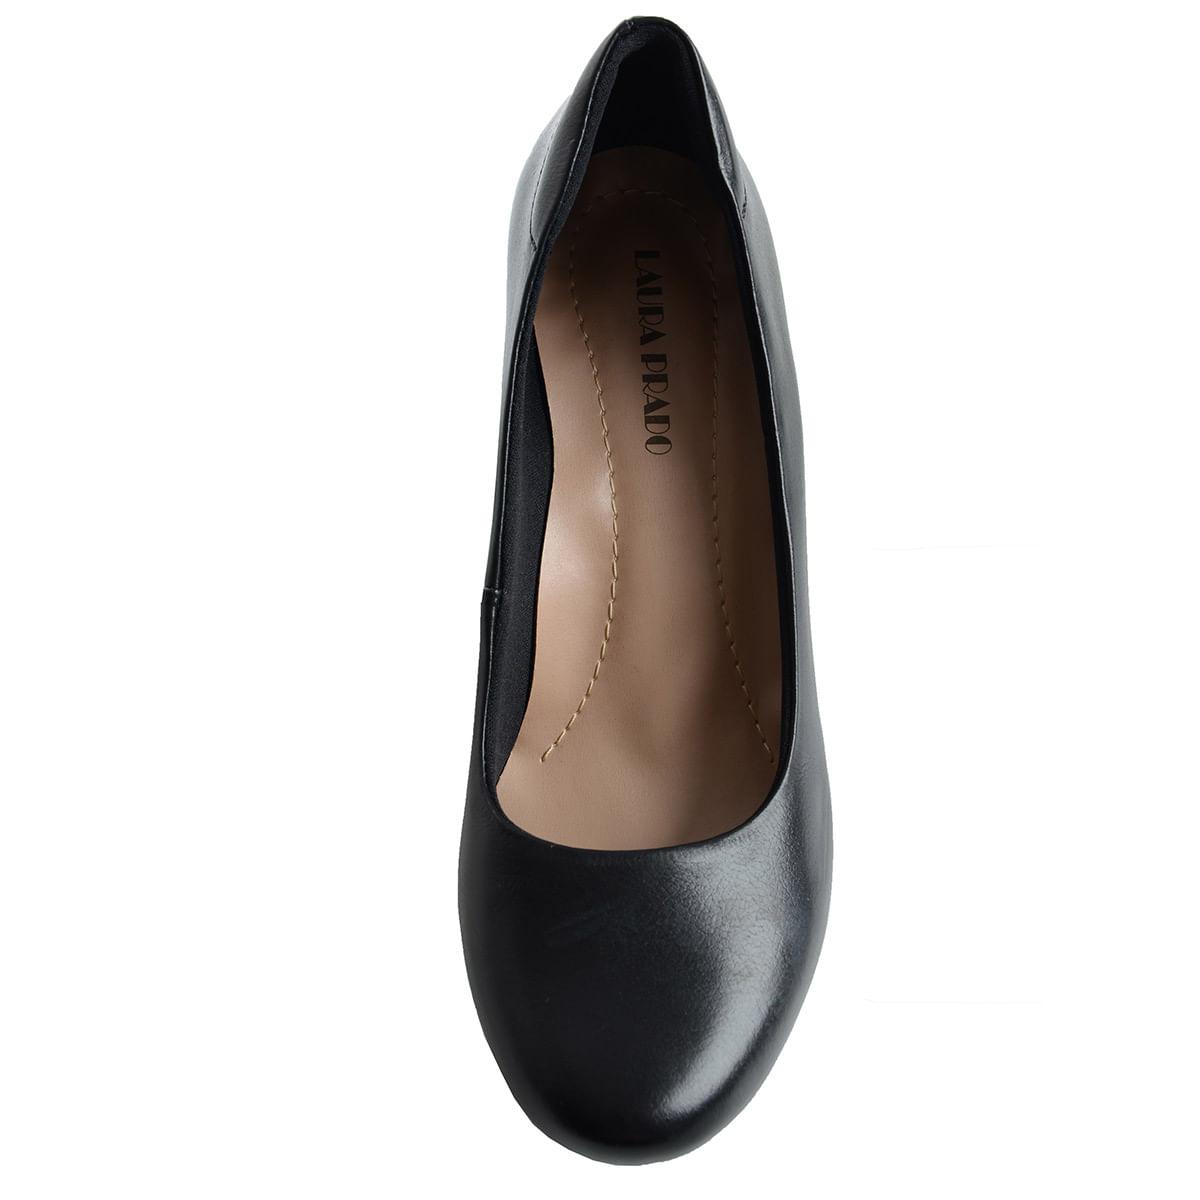 44c8138de Sapato Fechado Confort Preto - Laura Prado